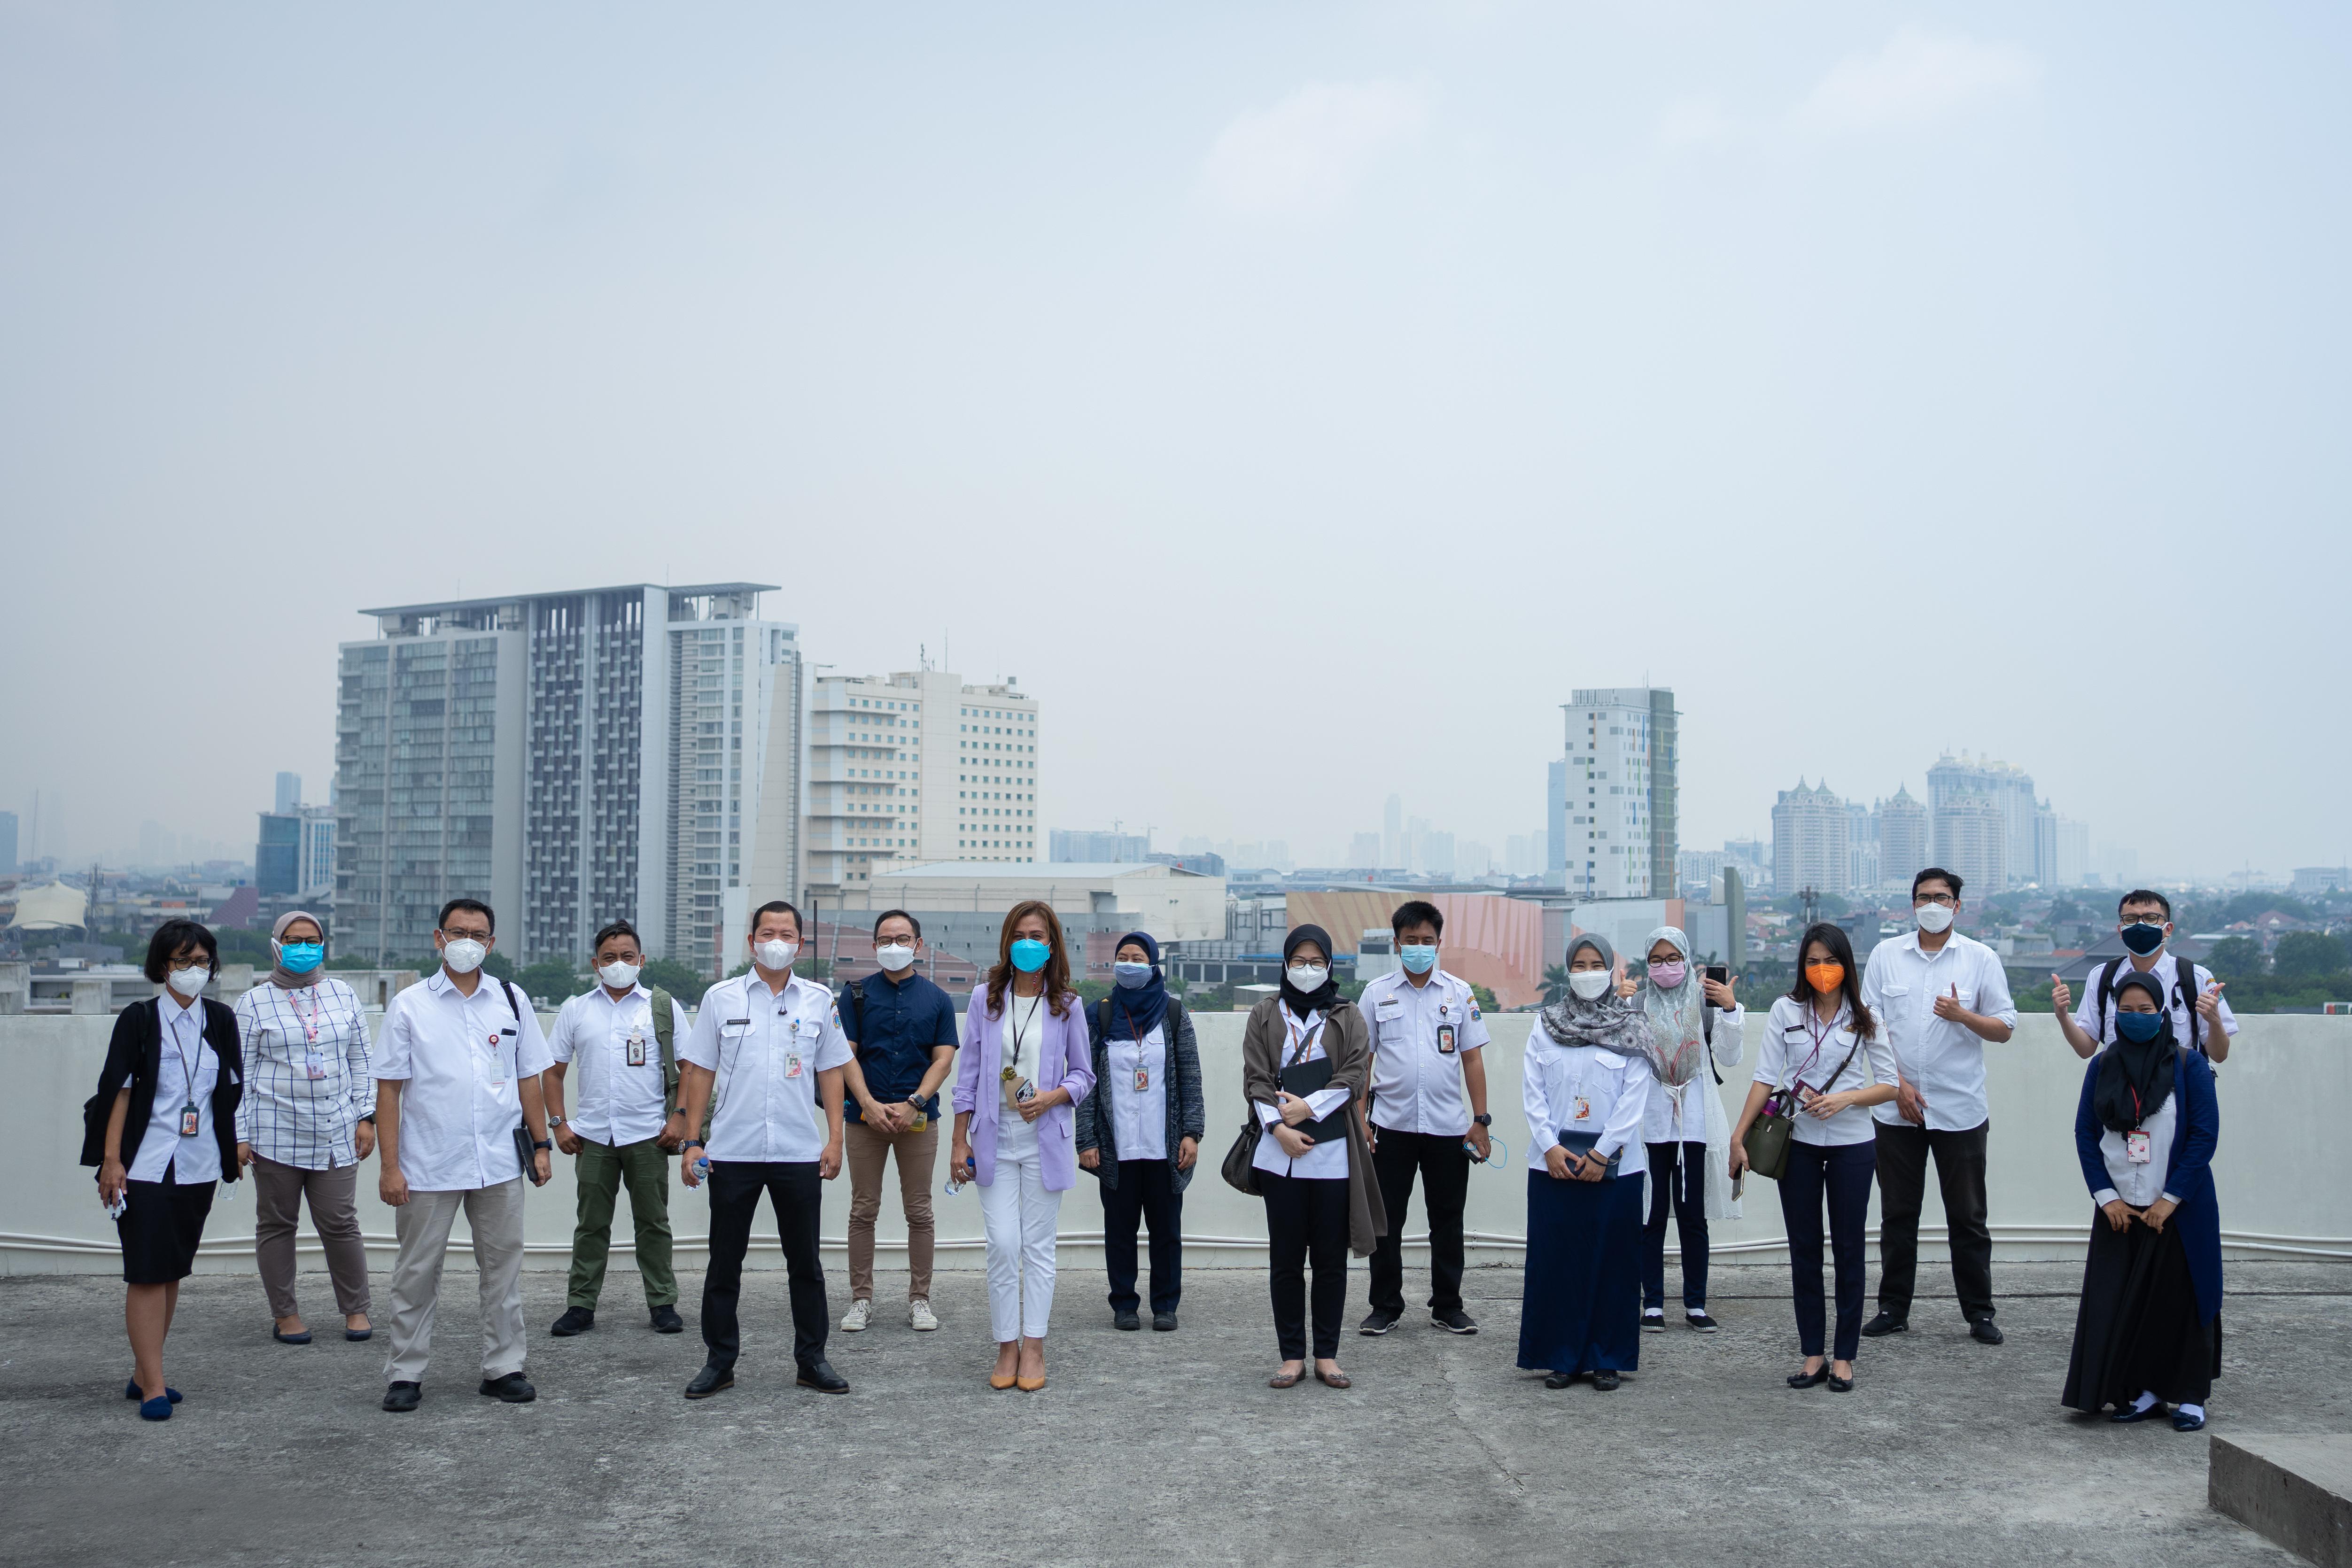 Kunjungan Jakarta Investment Center & BusDev Jakarta Propertindo